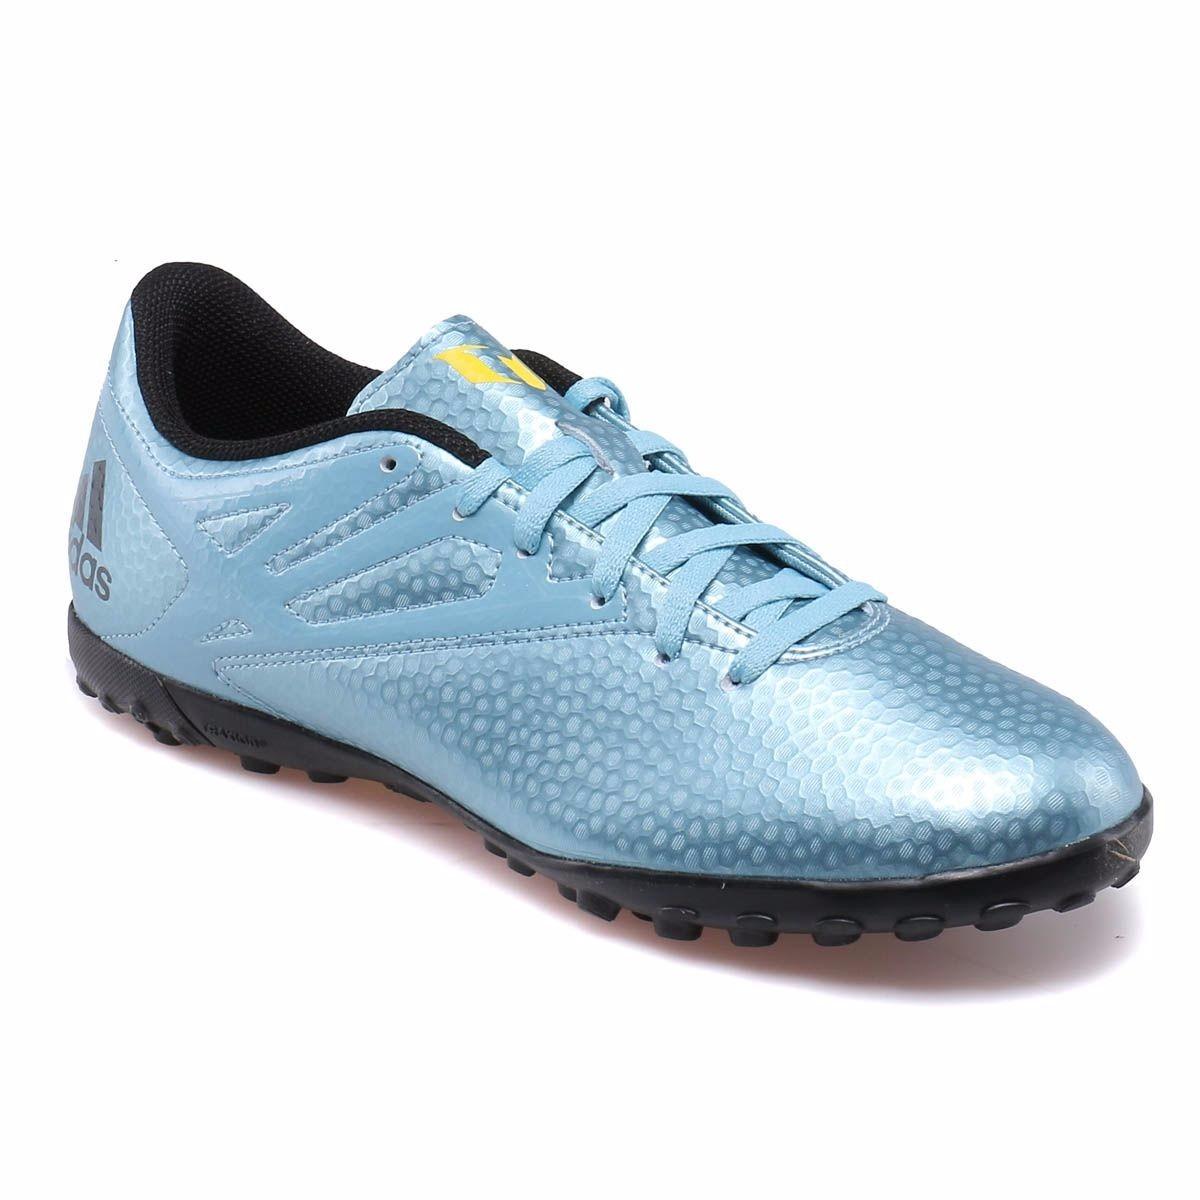 c62575944a adidas Messi 15.4 Tf Niño Azul Tenis Turf Pasto Agotado -   699.99 ...